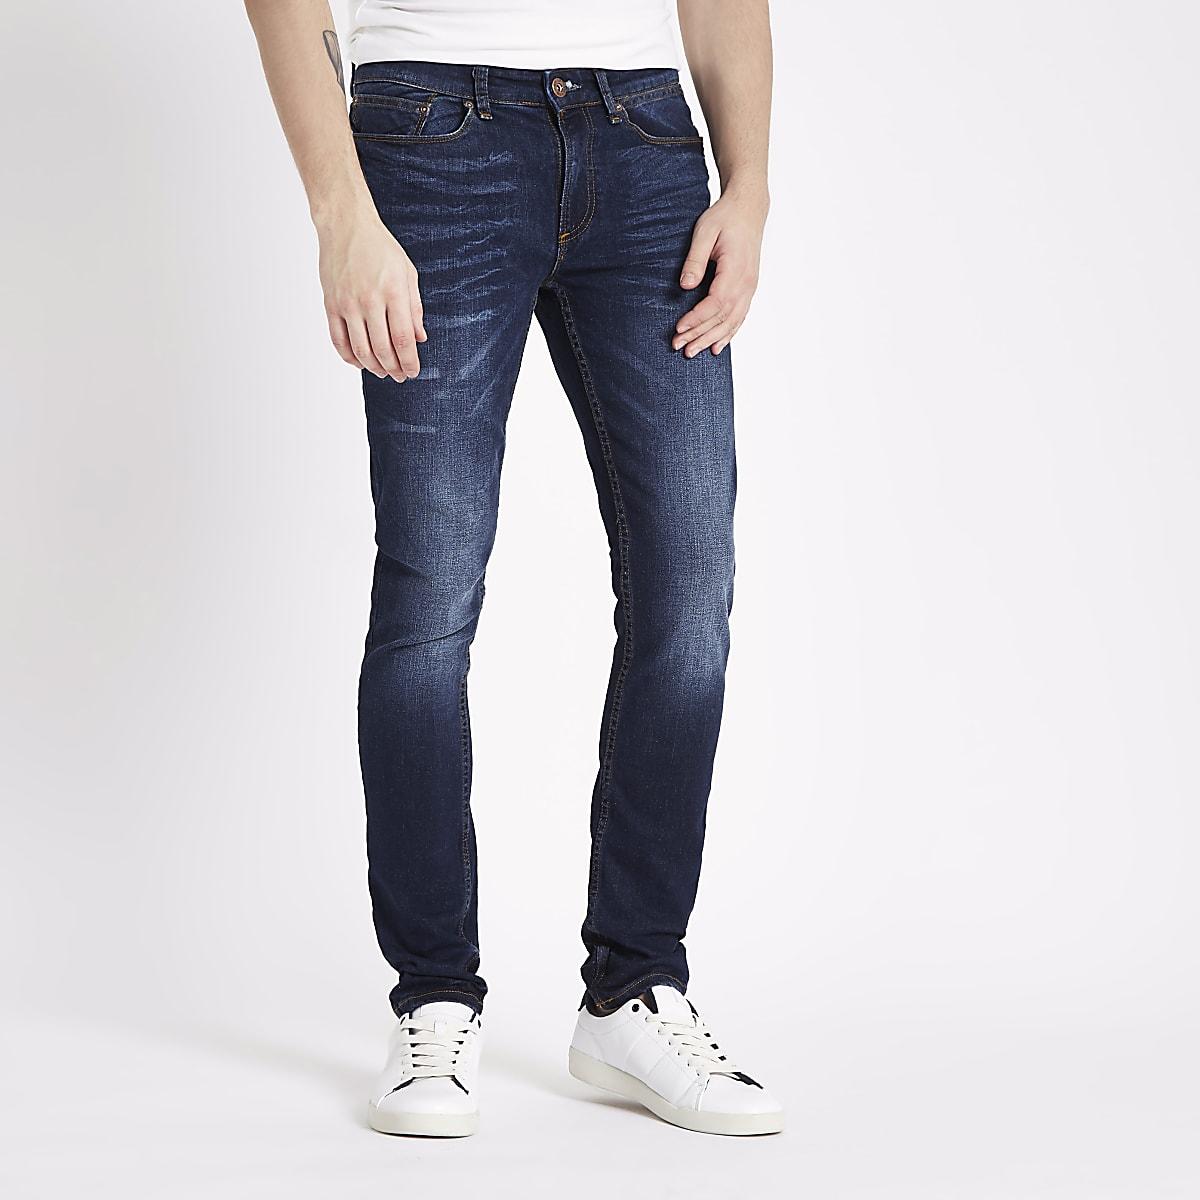 06d68a4b8 Dark Blue Denim Jeans Mens - The Best Style Jeans